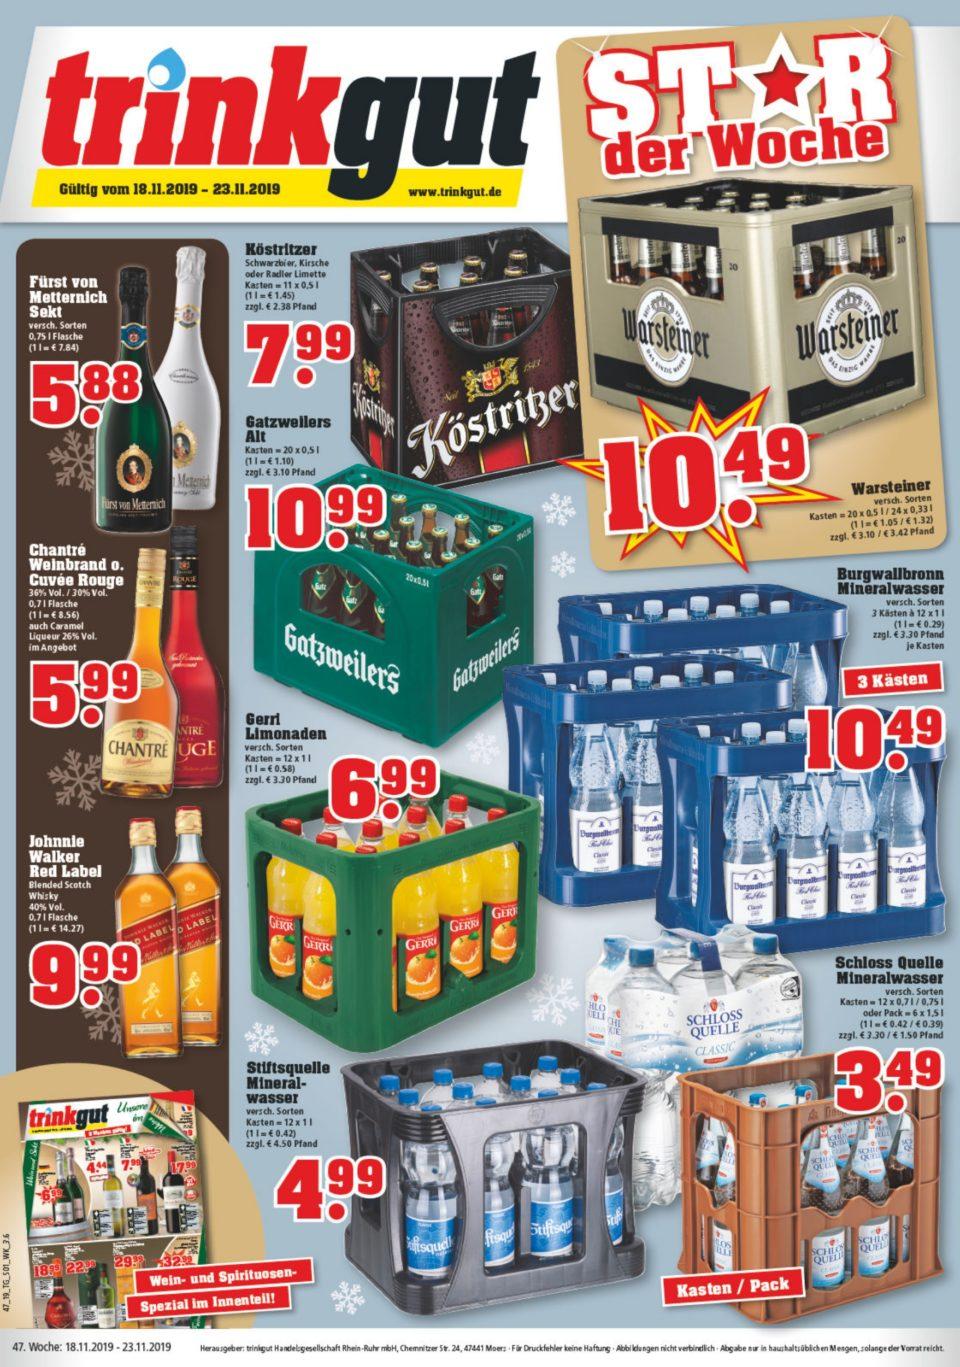 Trinkgut Angebote gültig vom 18.11.2019 bis 23.11.2019